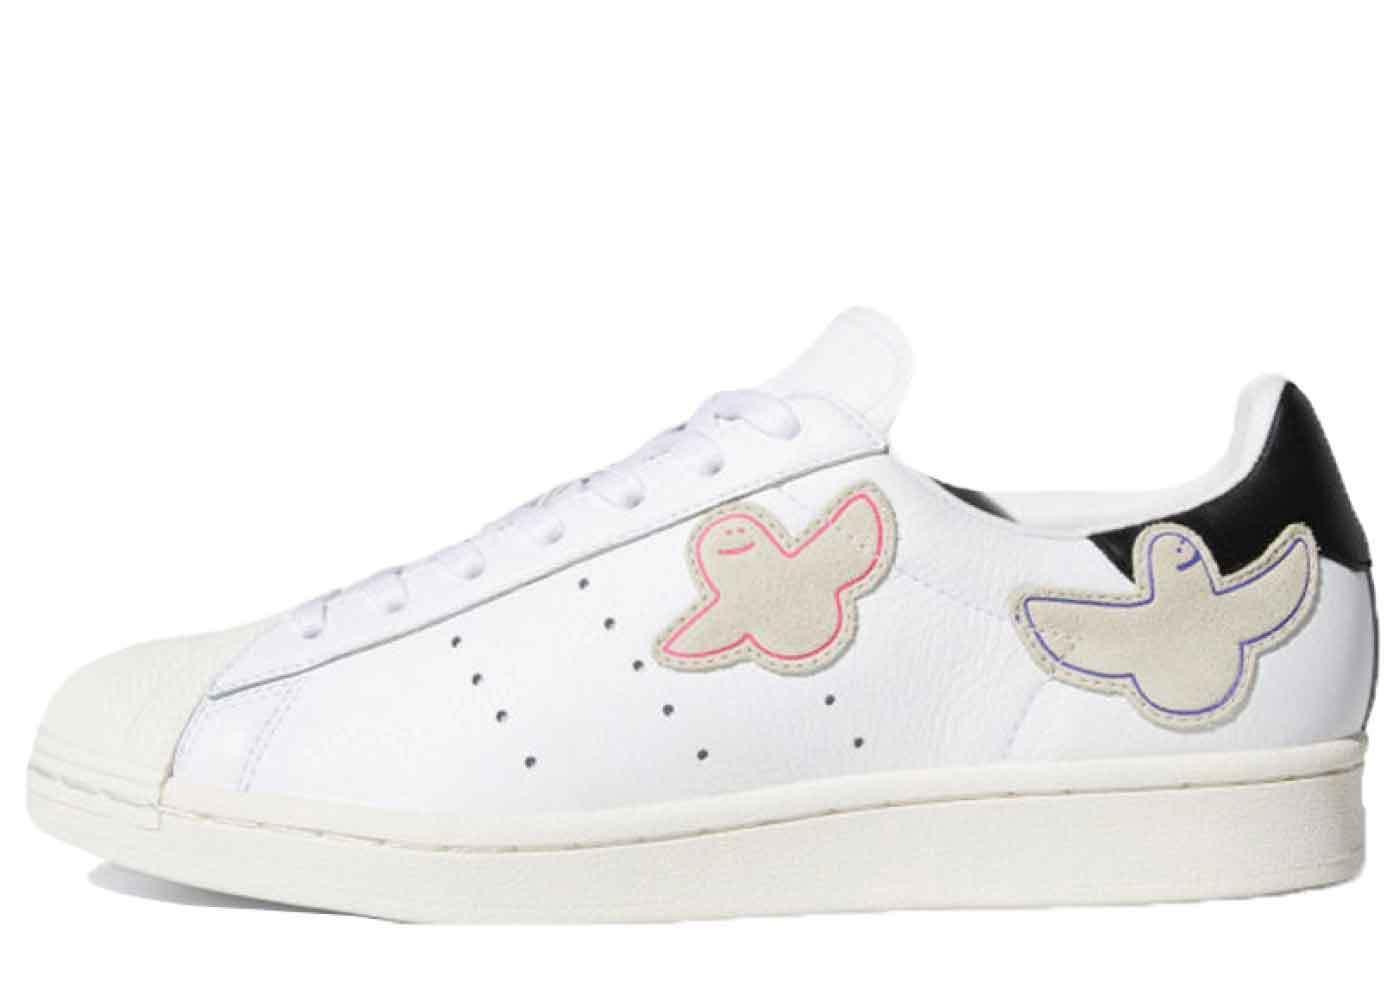 Mark Gonzales × Adidas Skateboarding Superstar Whiteの写真